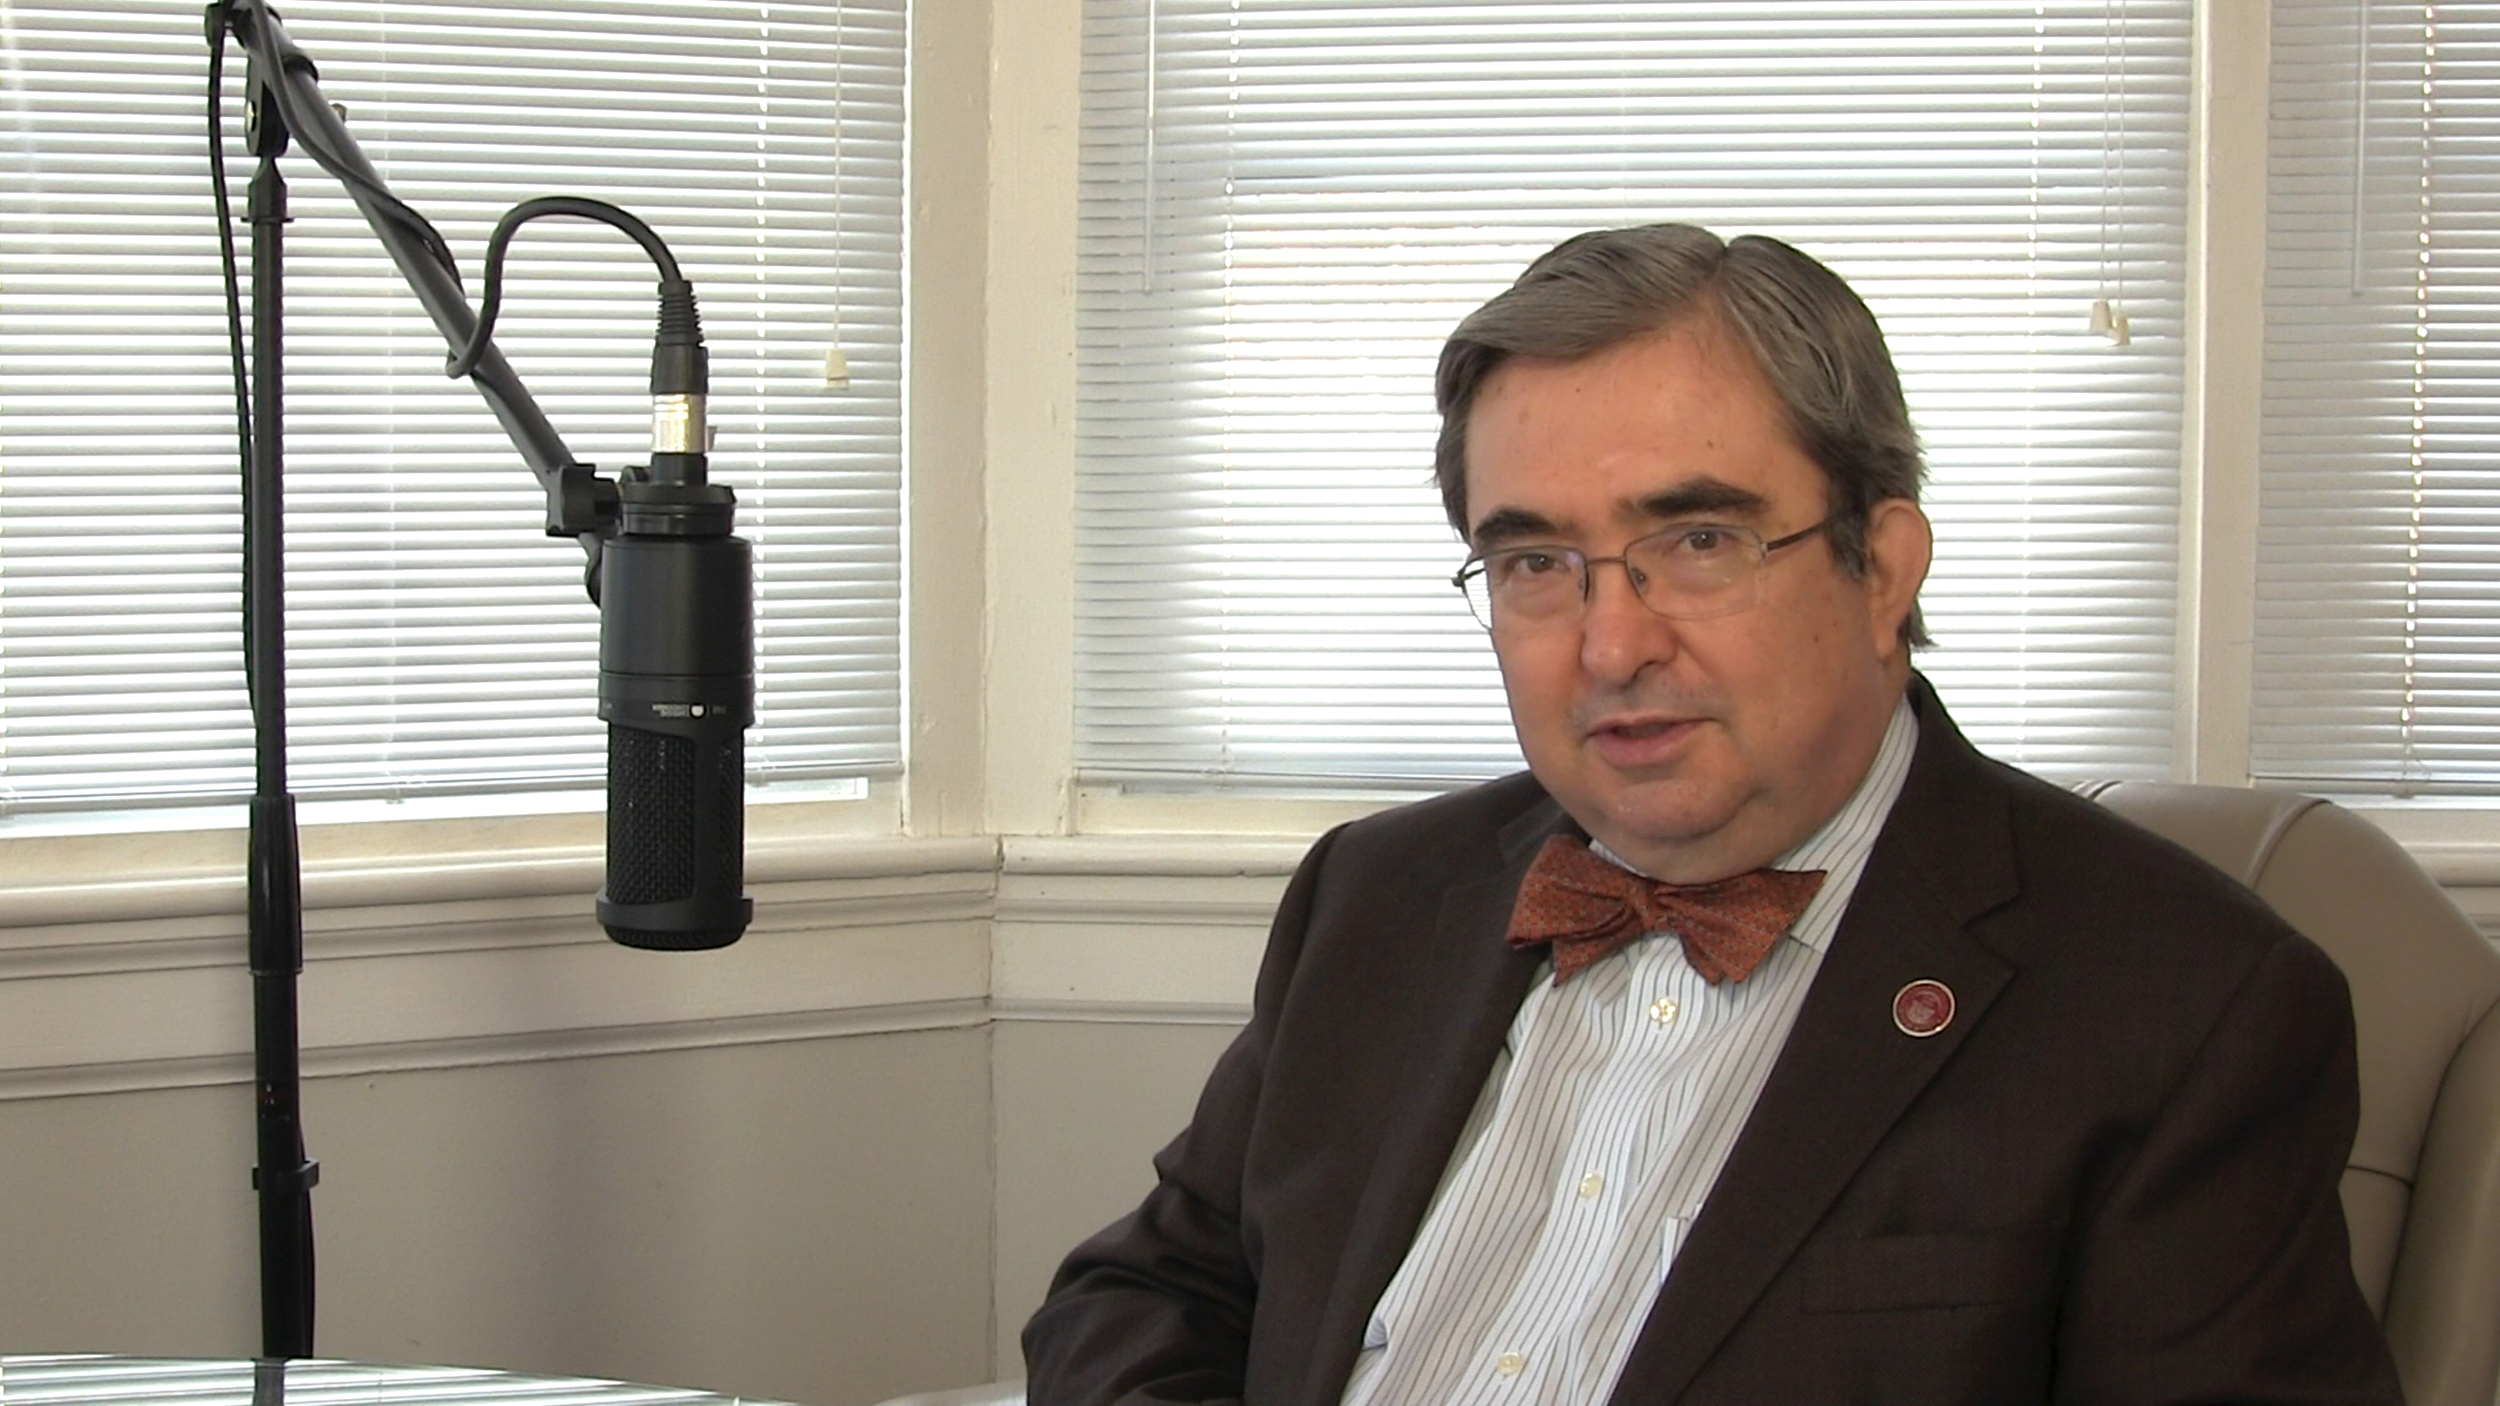 Dr. Peter Mercer, President of Ramapo College - Mahwah